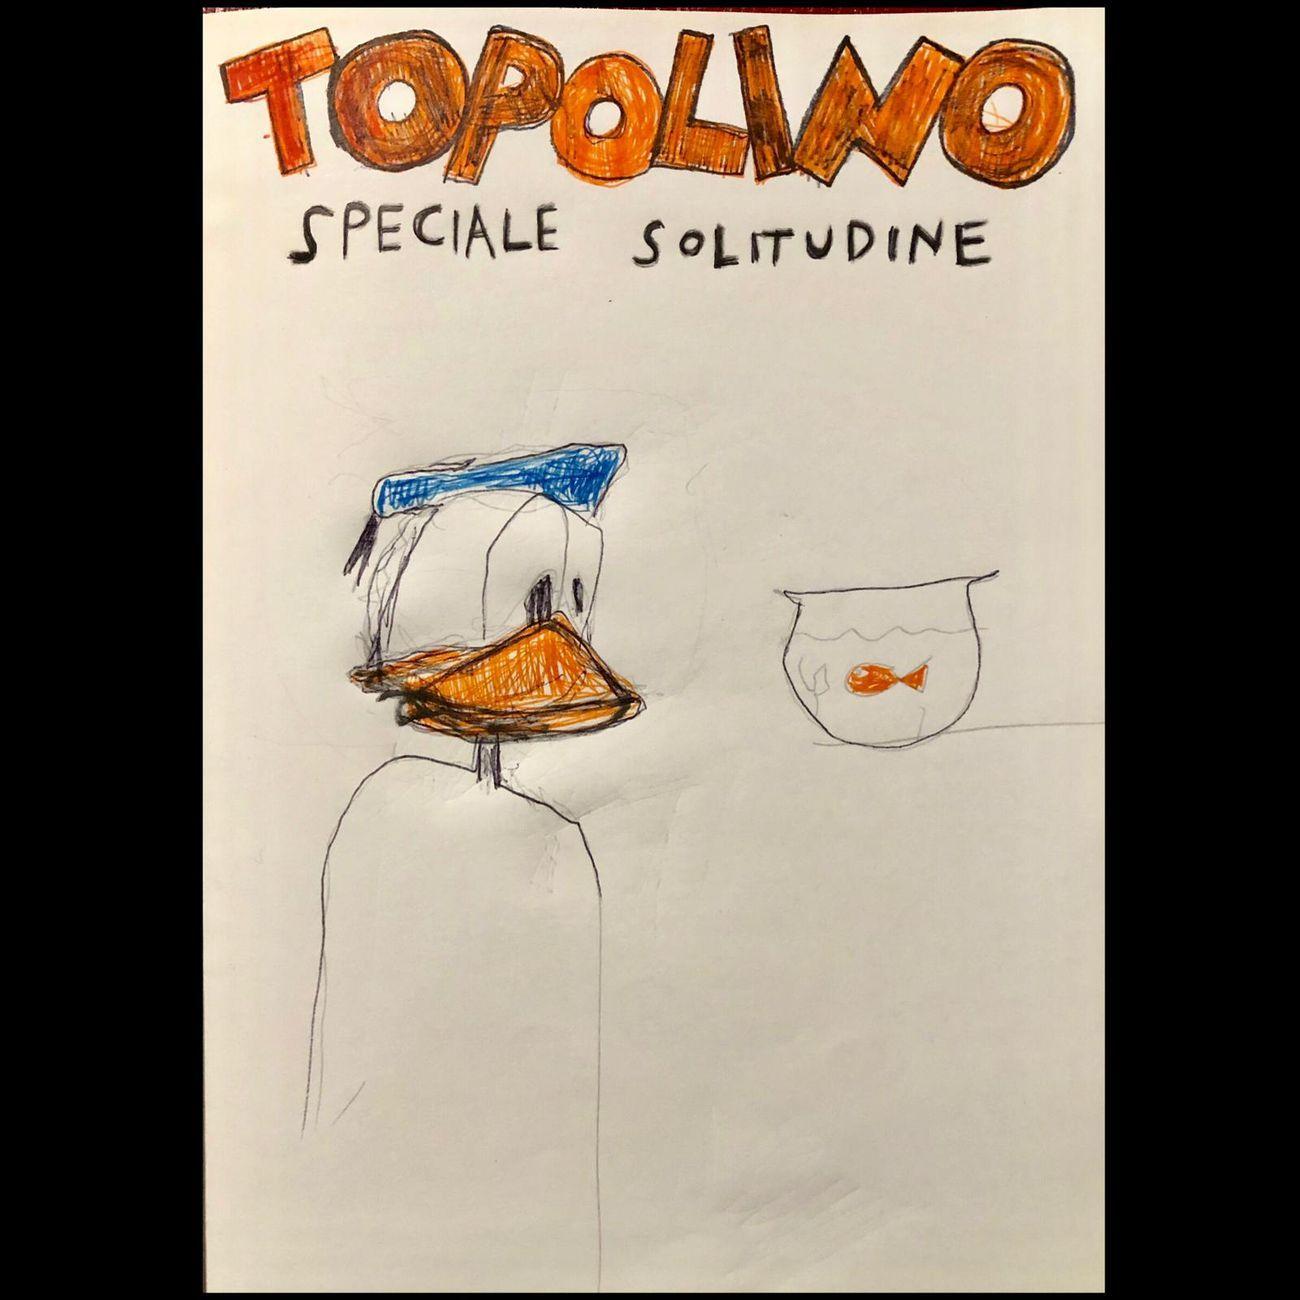 Manuel Cossu, Topolino, speciale Solitudine, 2019, tecnica mista su carta